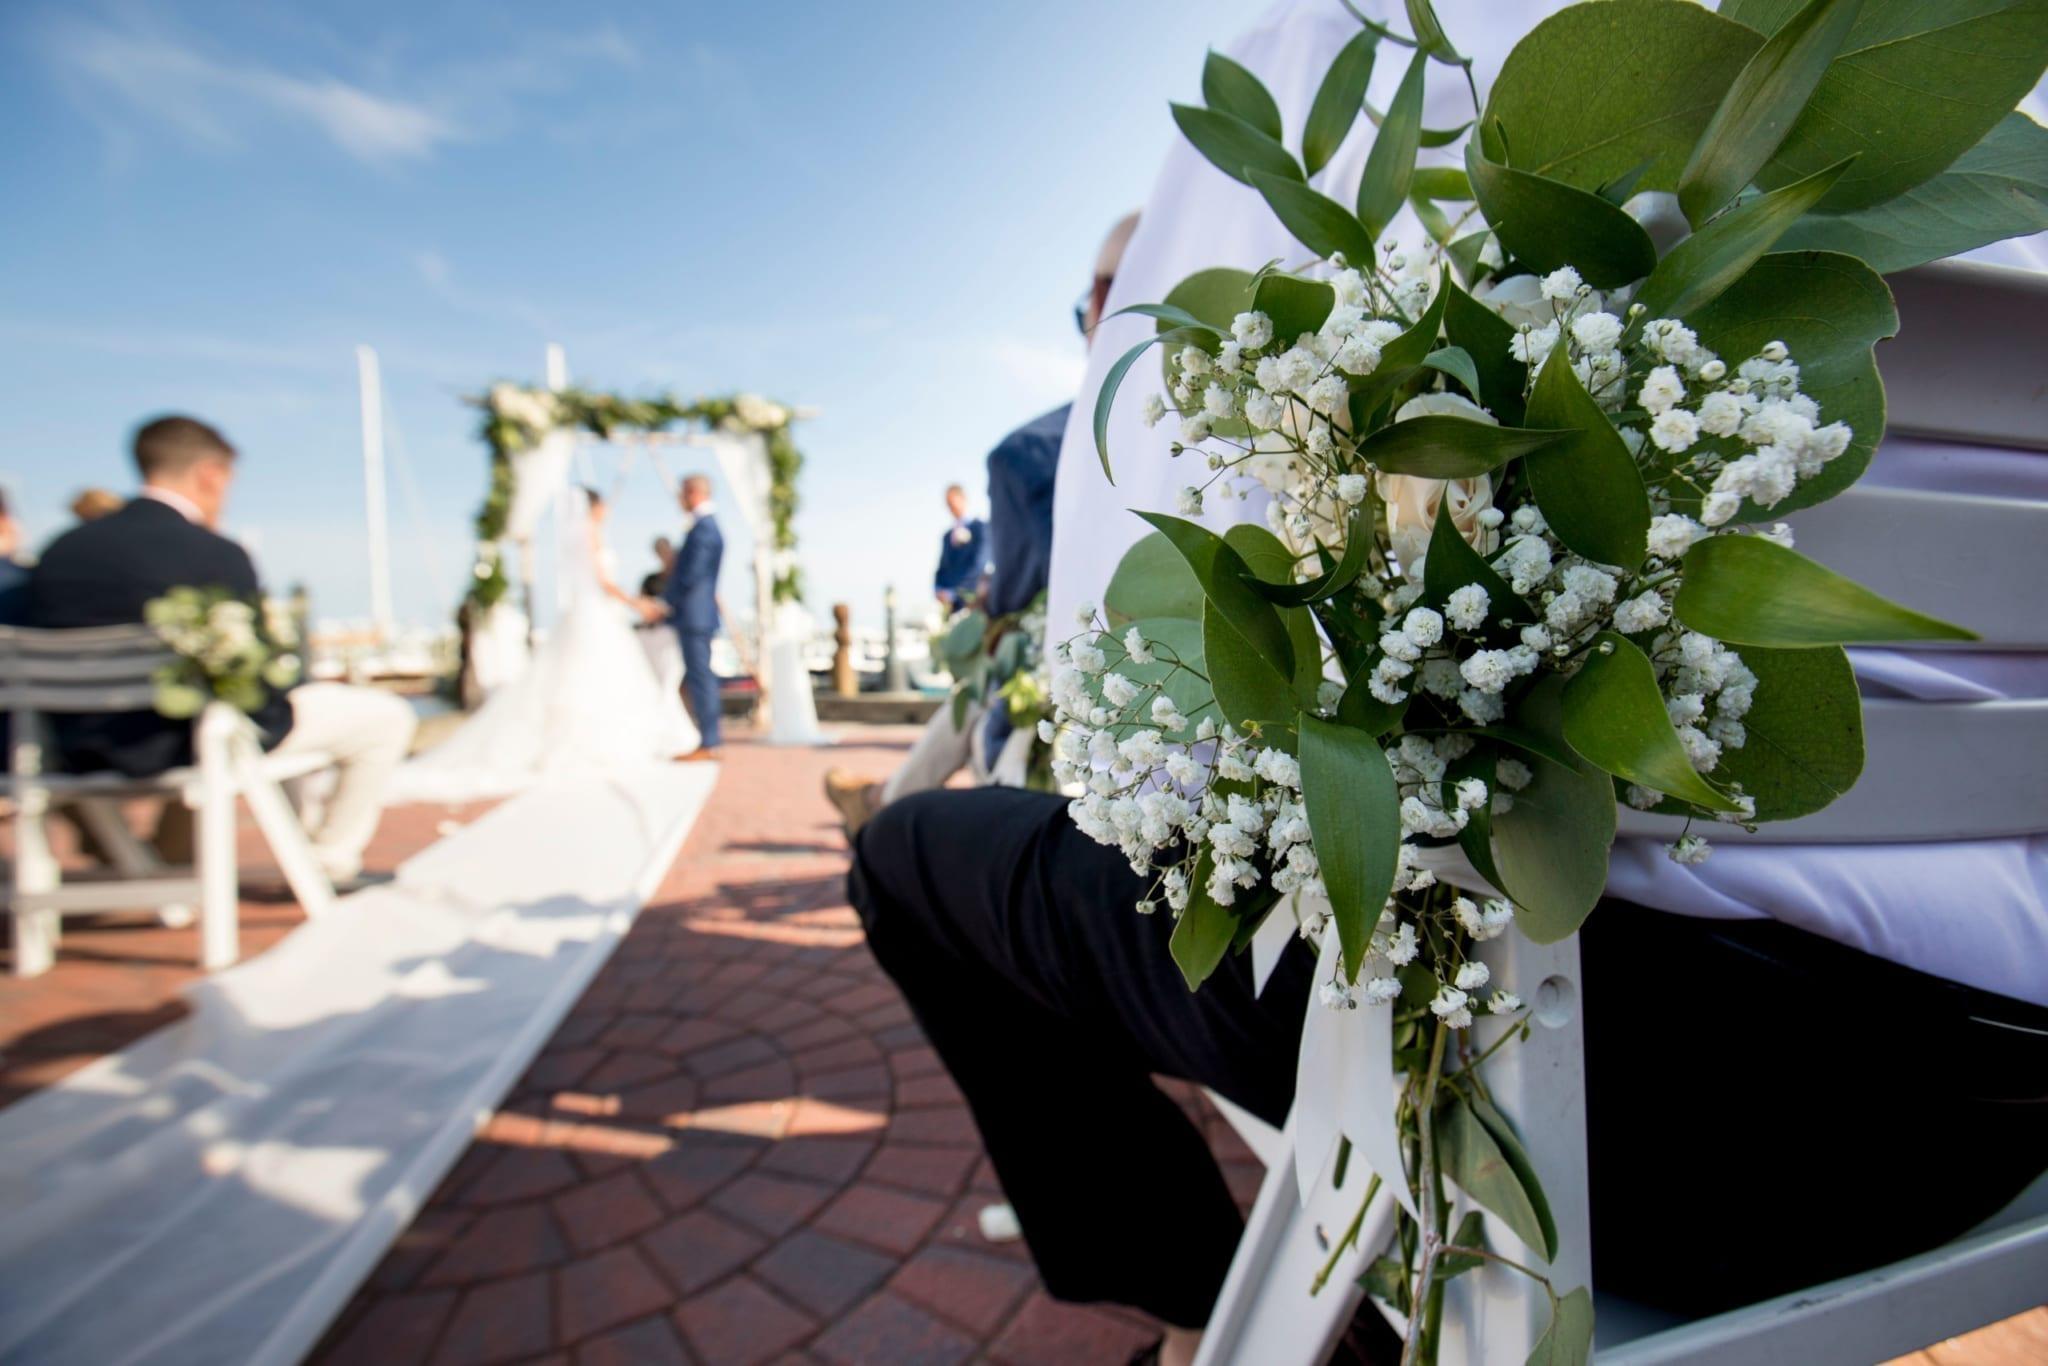 Wedding flowers on ceremony seating.